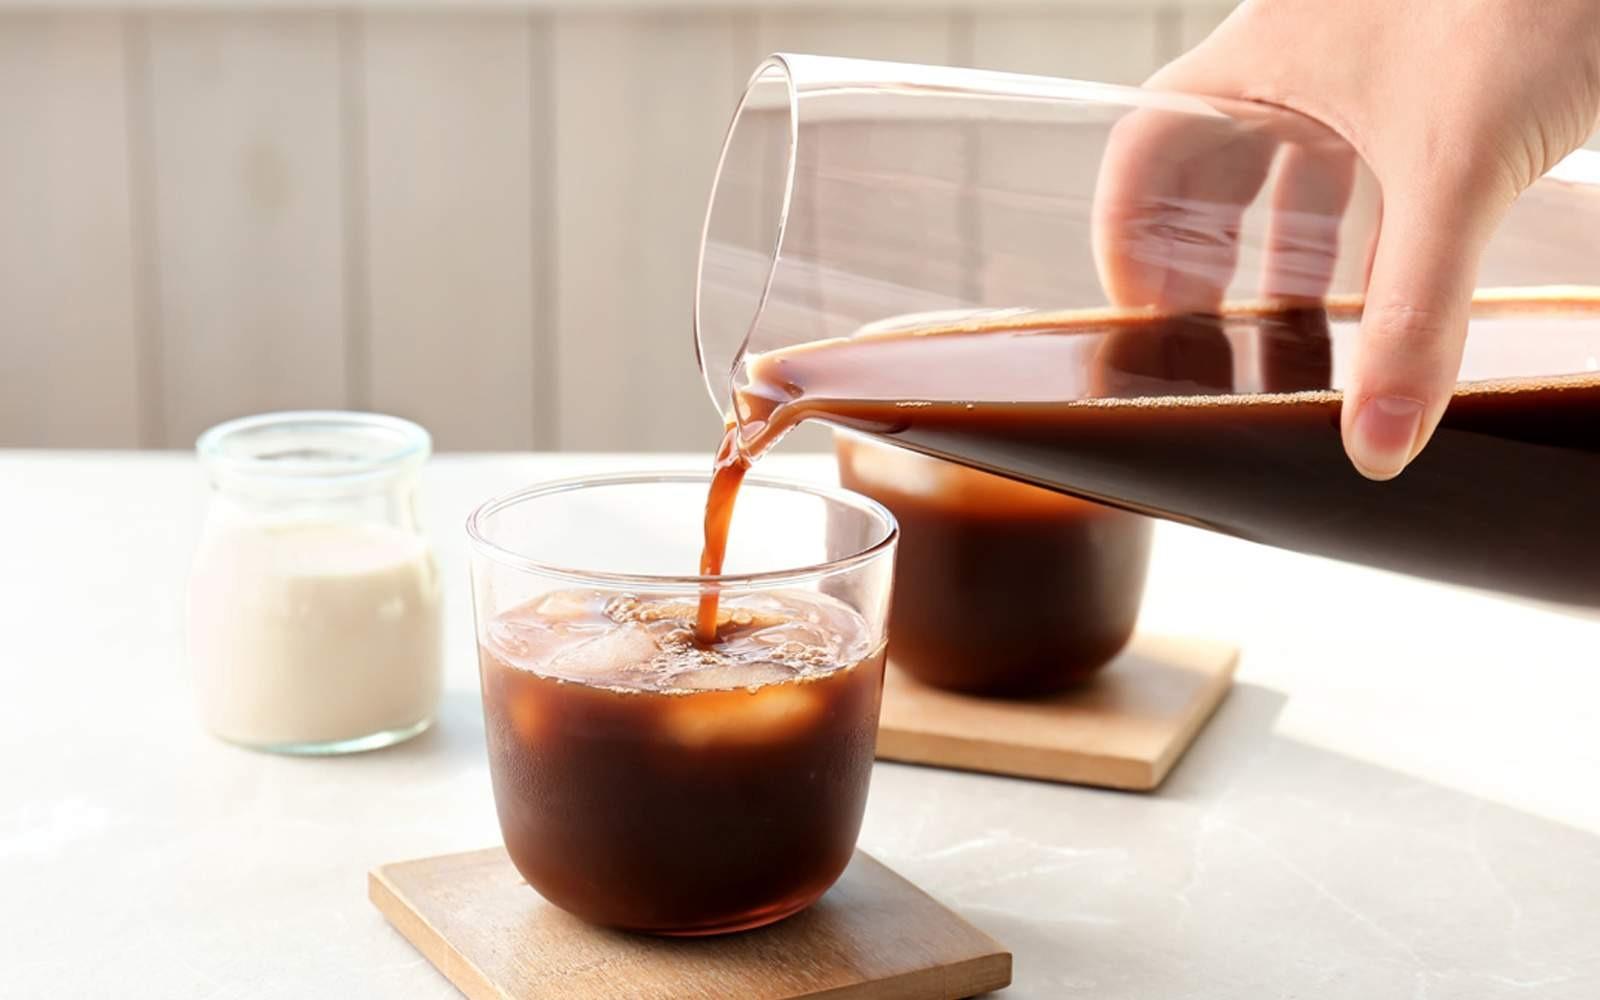 Ketahui Tips Minum Kopi yang Aman bagi Diabetes